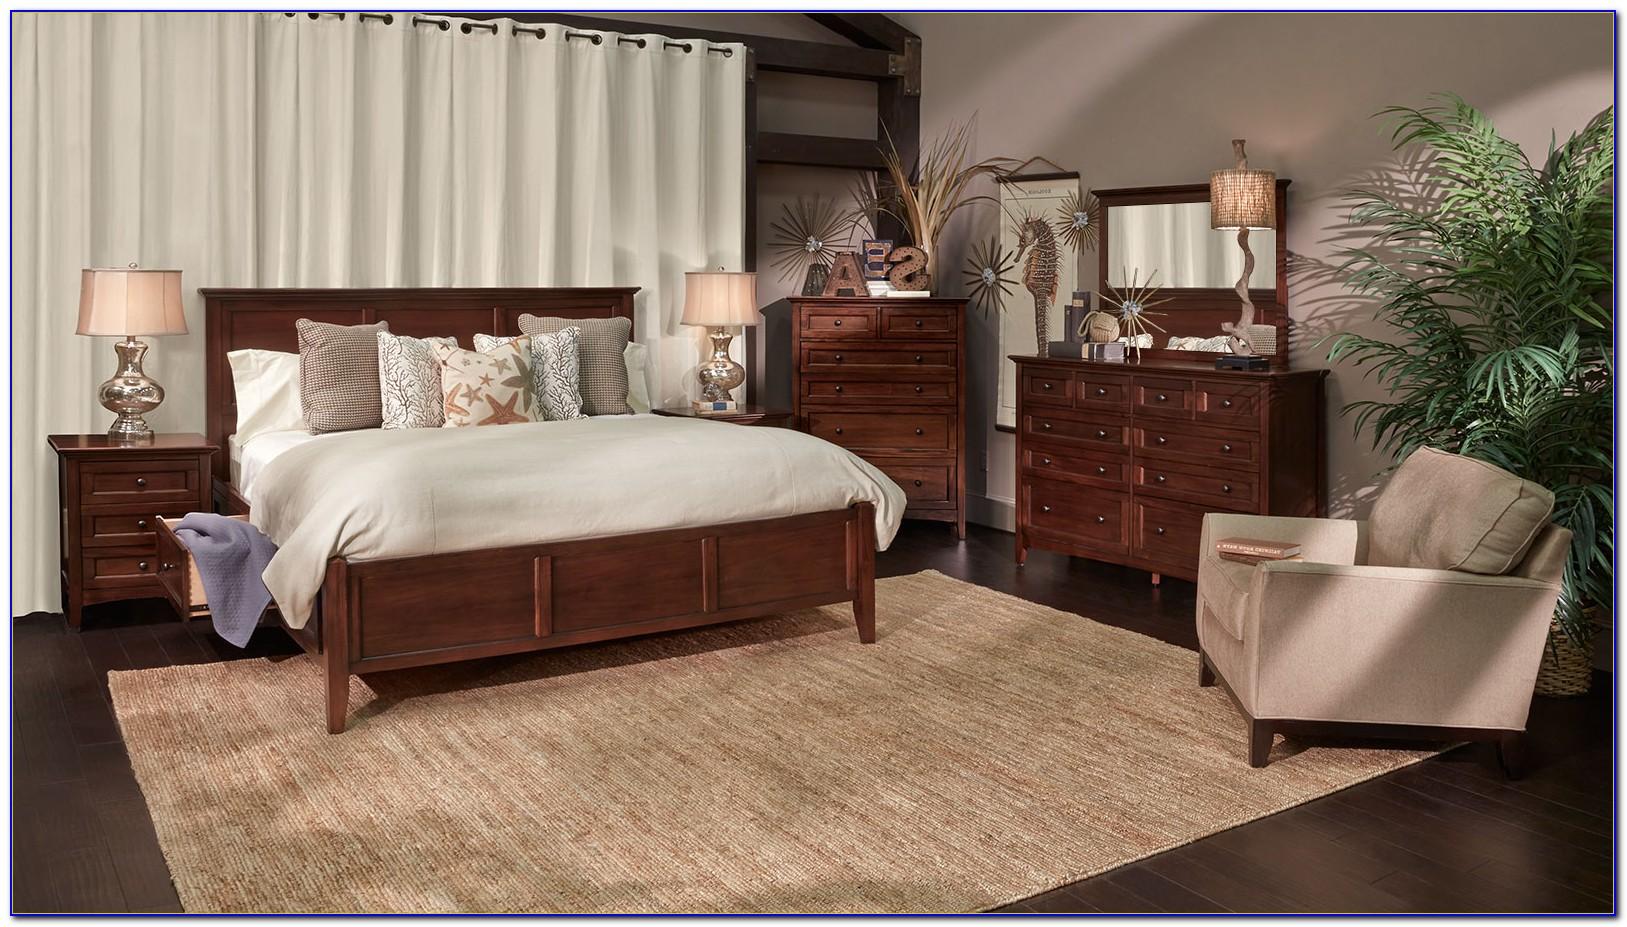 Gallery Furniture Houston Monkeys